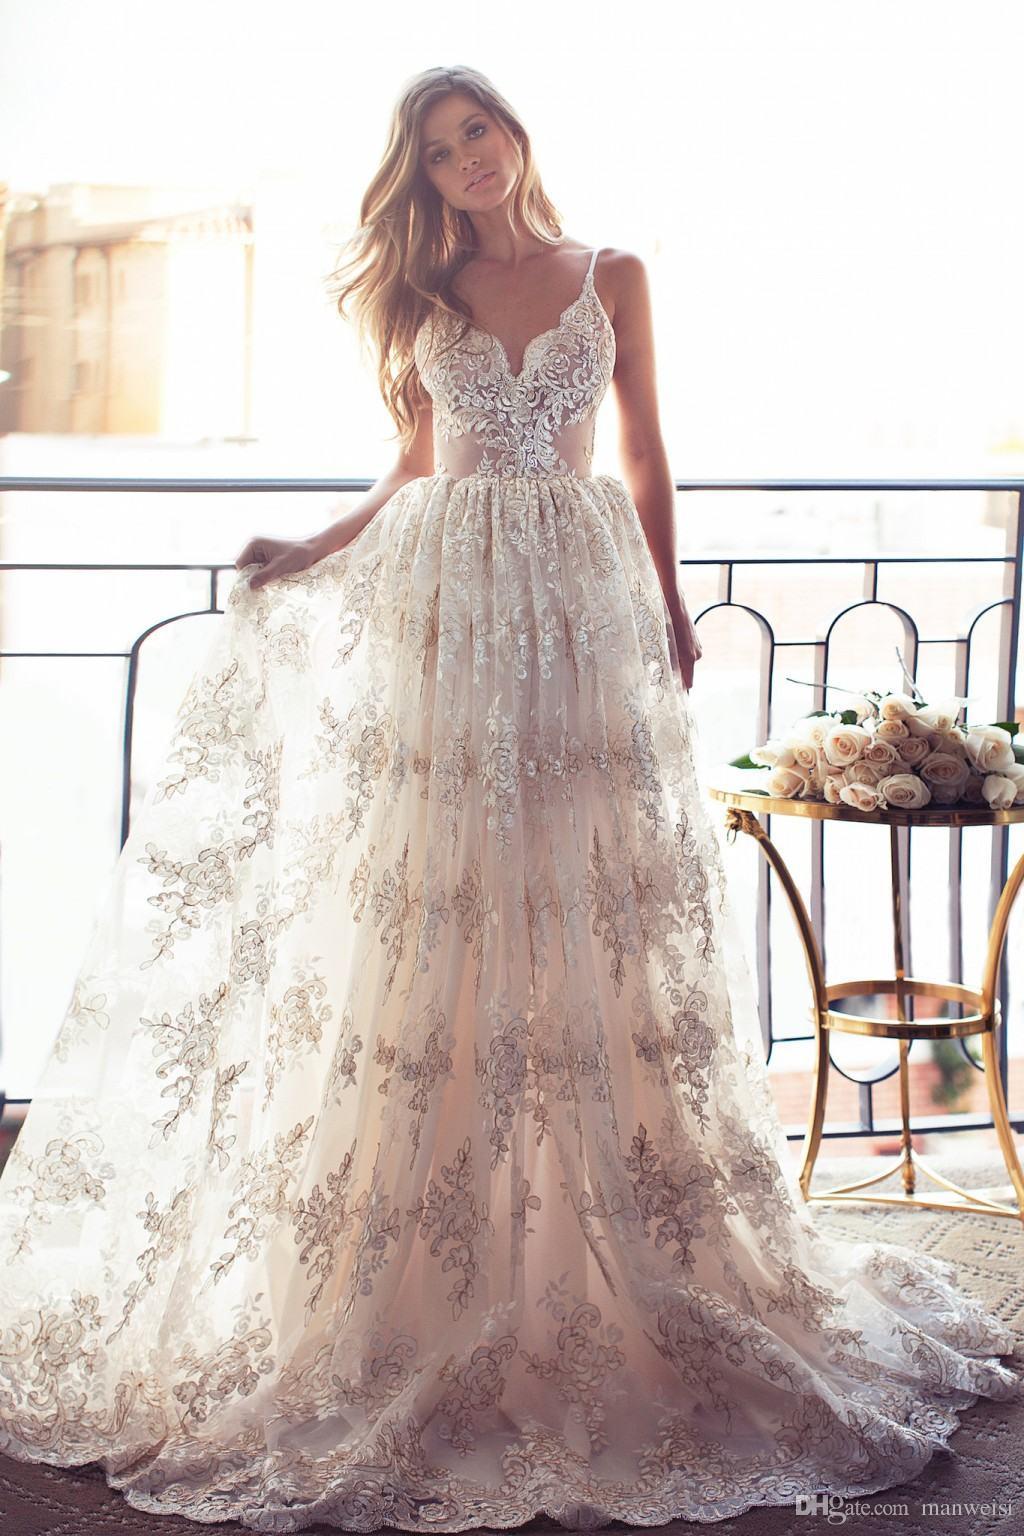 Romantic A-line Strapless Long Lace Wedding Dress · modsele · Online ...